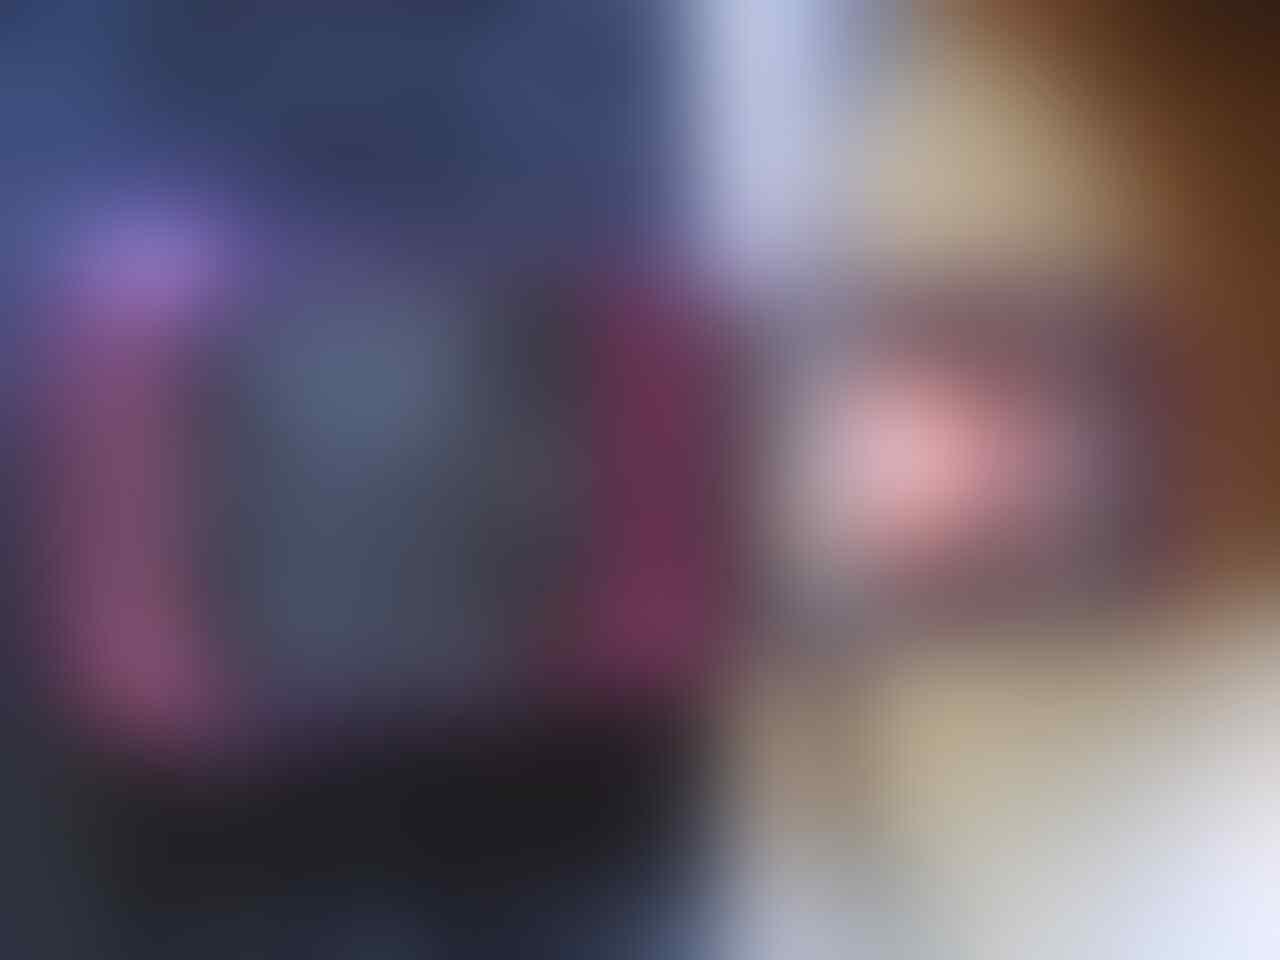 Nokia Lumia 710 Black Batangan